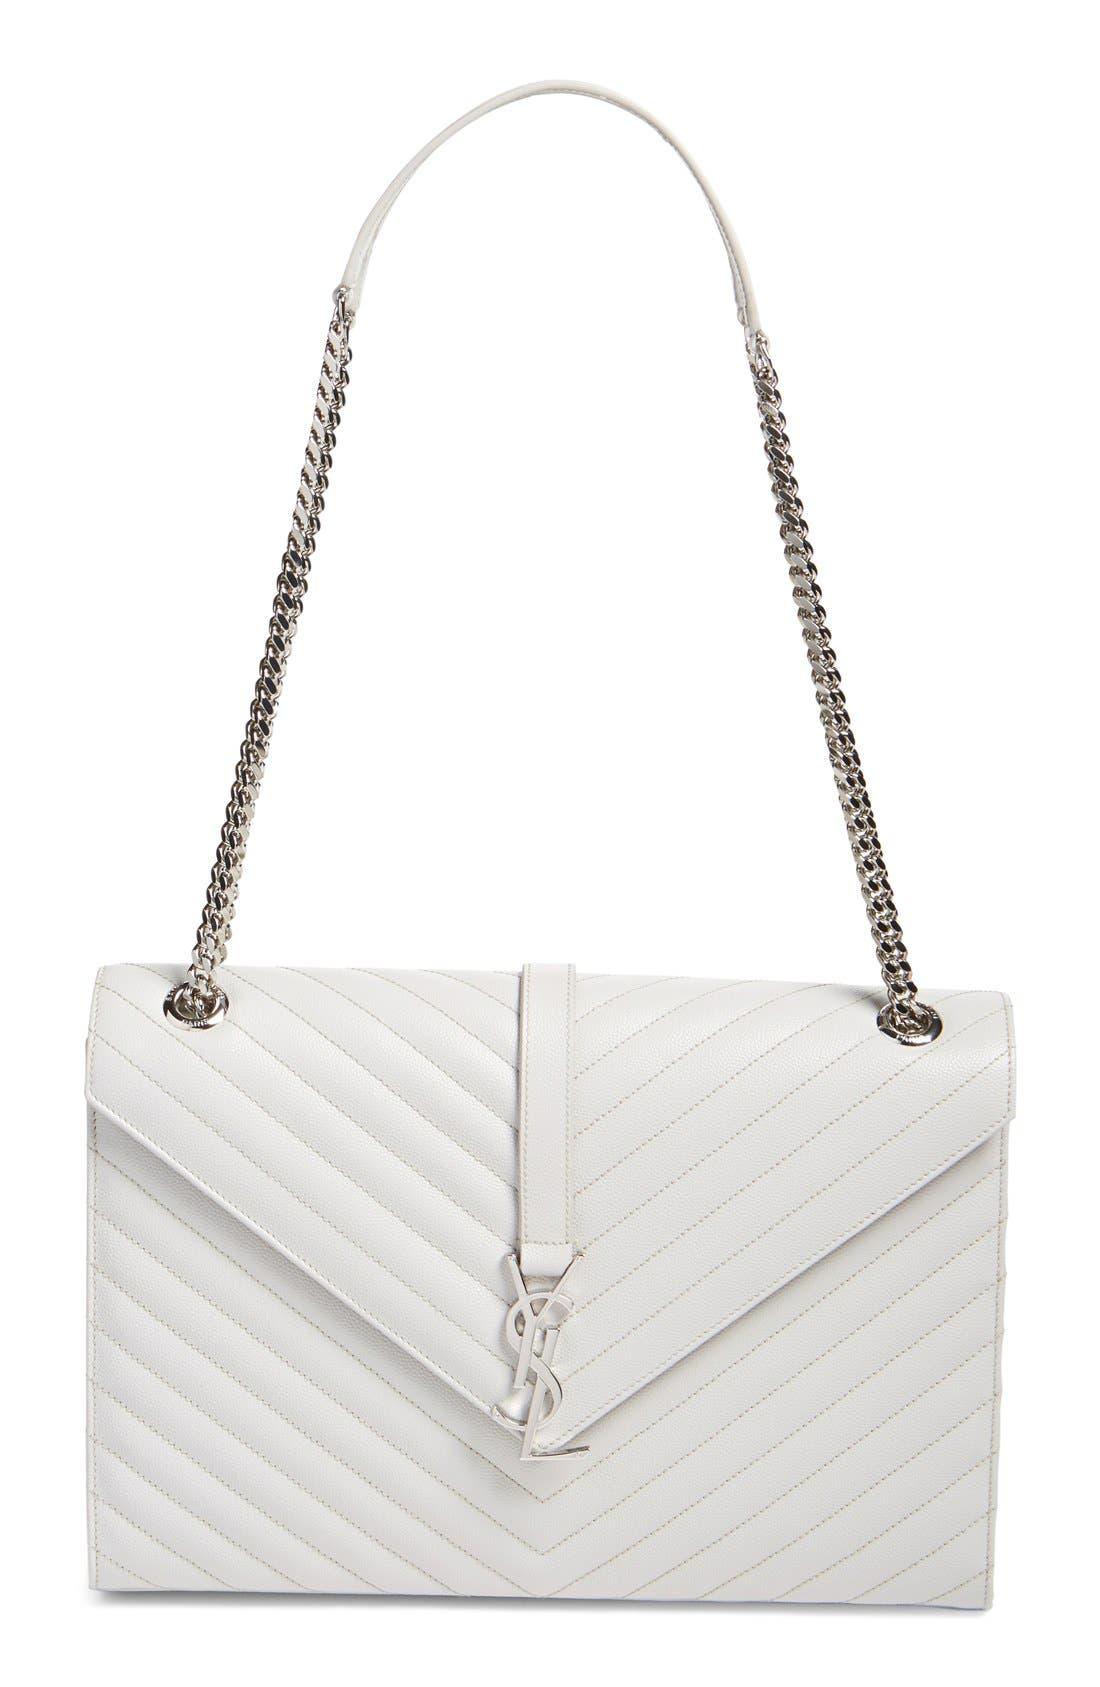 Main Image - Saint Laurent 'Monogram' Chevron Quilted Leather Shoulder Bag